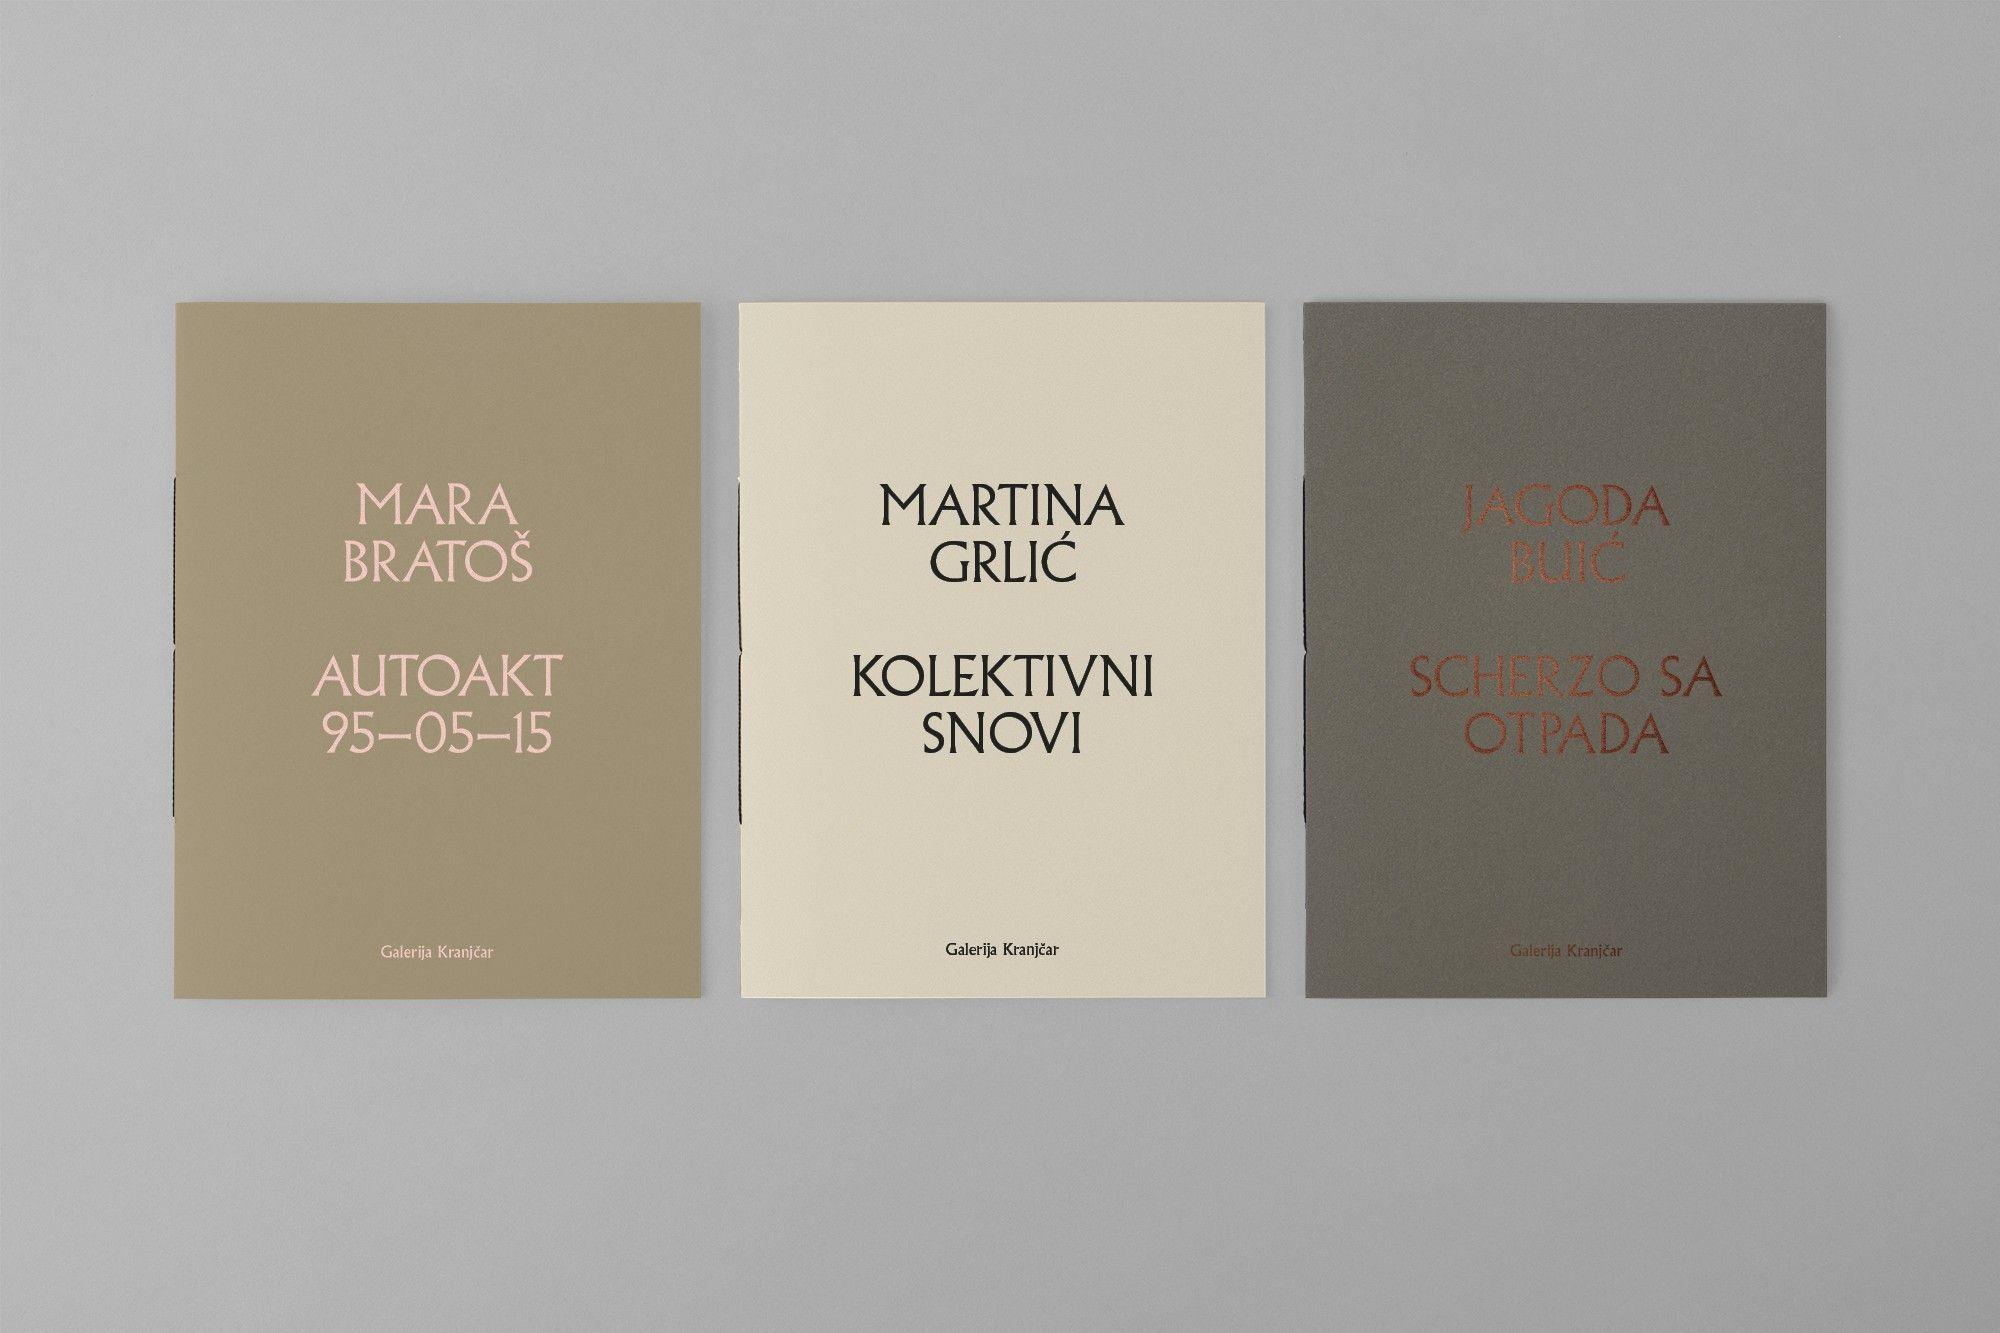 Bunch Is A Design Studio Offering Diverse Range Of Work Including Identity Literature Art Di Blog Design Inspiration Graphic Design Typography Graphic Design